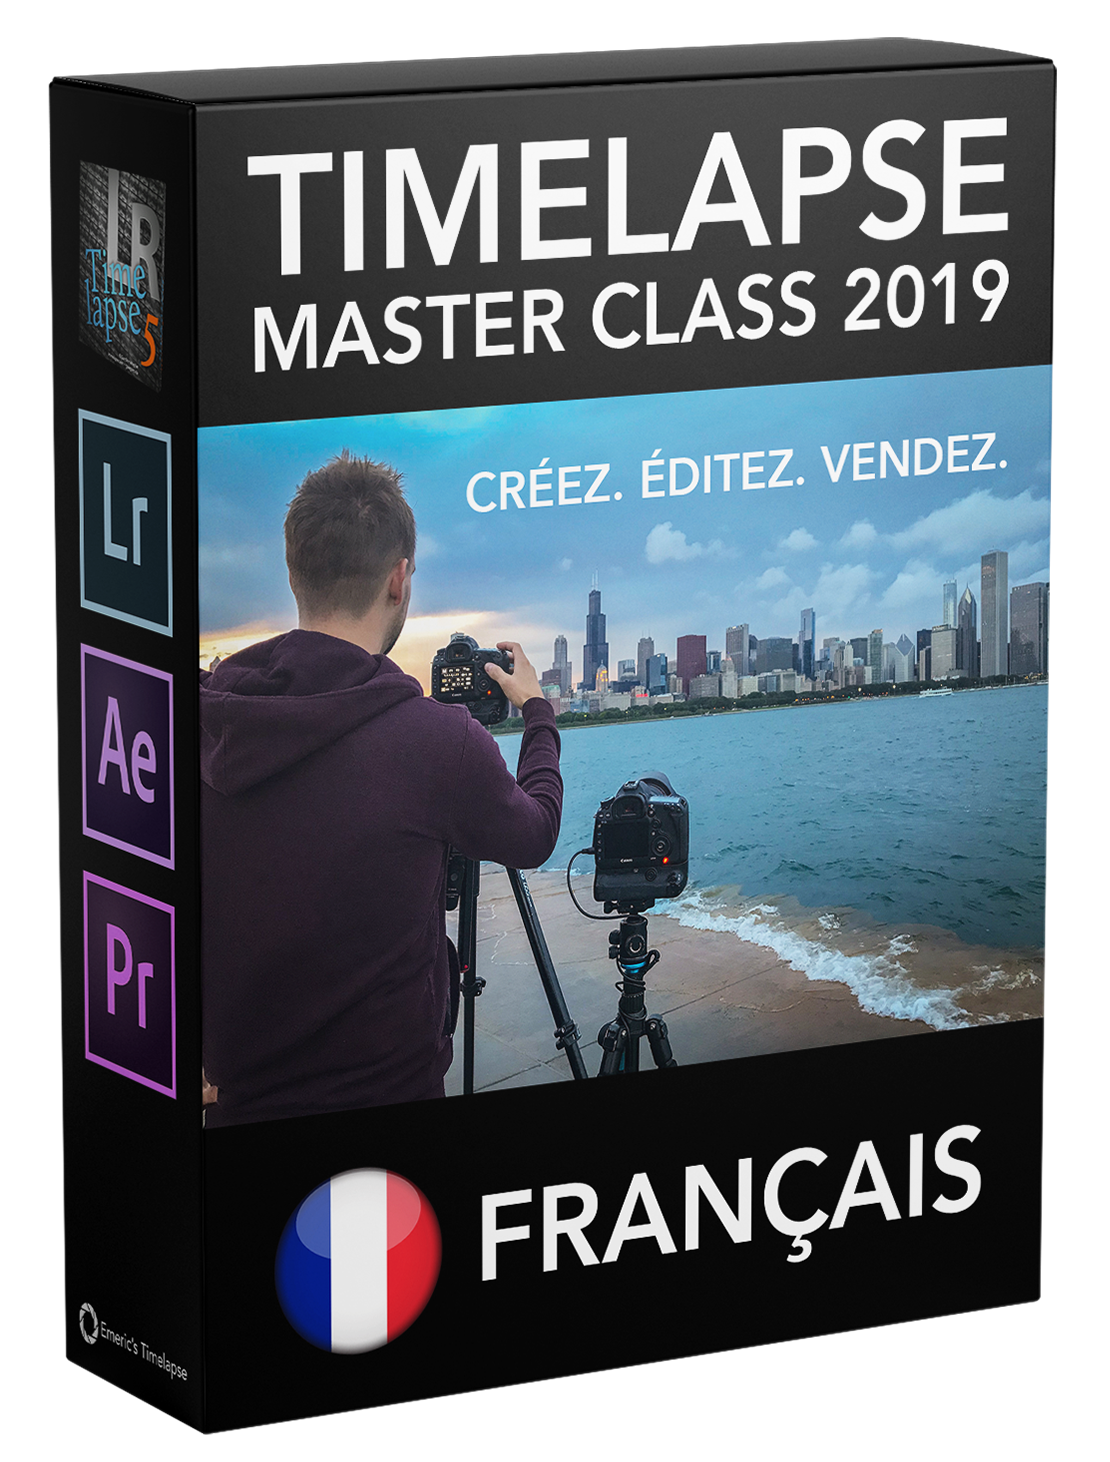 Timelapse Master Class 2019